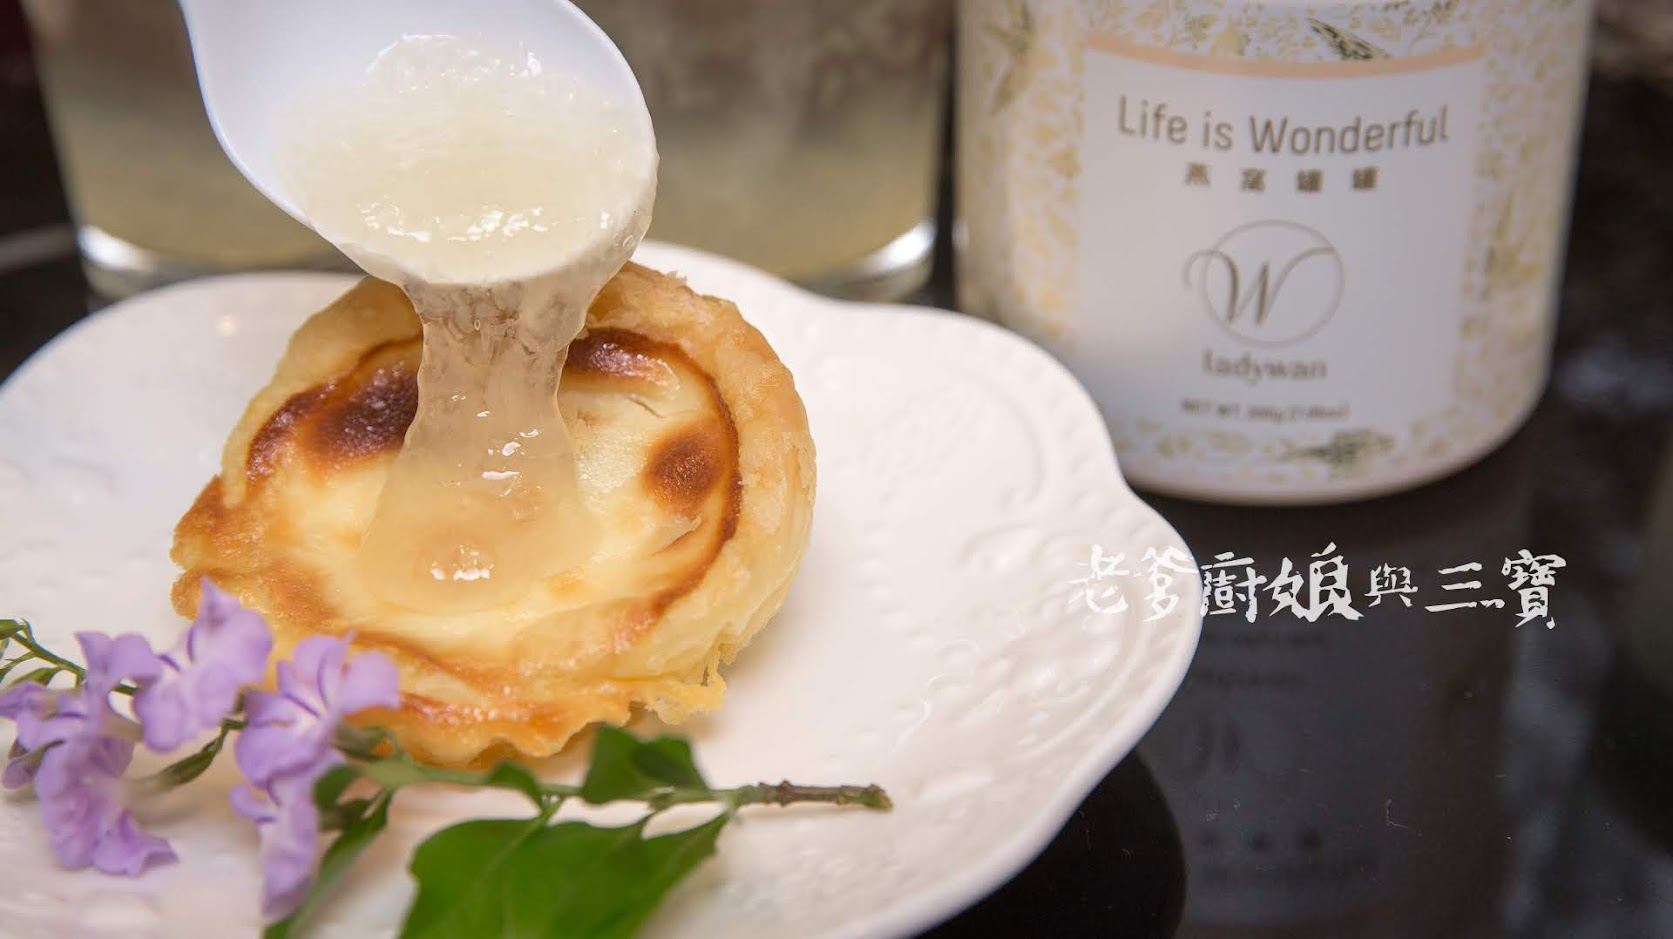 LadyWan旺小姐 即食燕窩罐罐禮盒...來自泰國的高級養顏美容聖品ㄟ!廚娘要水到出汁了!